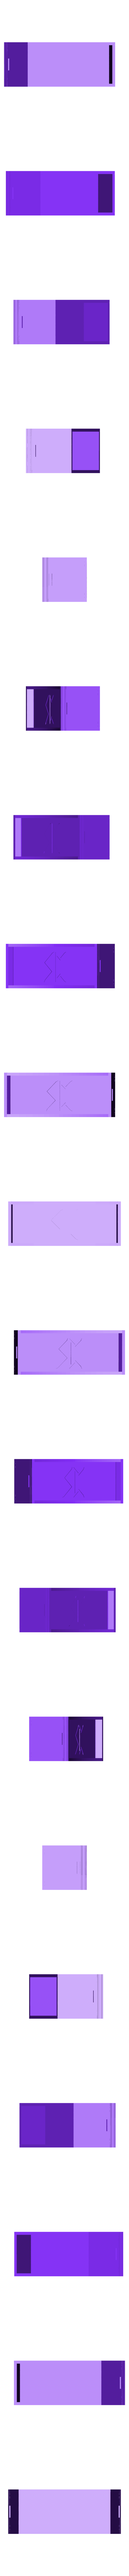 MVC_Box_HistoricalModel.stl Download free STL file Viking Chest - Hedeby and fantasy version • 3D printable design, Snorri